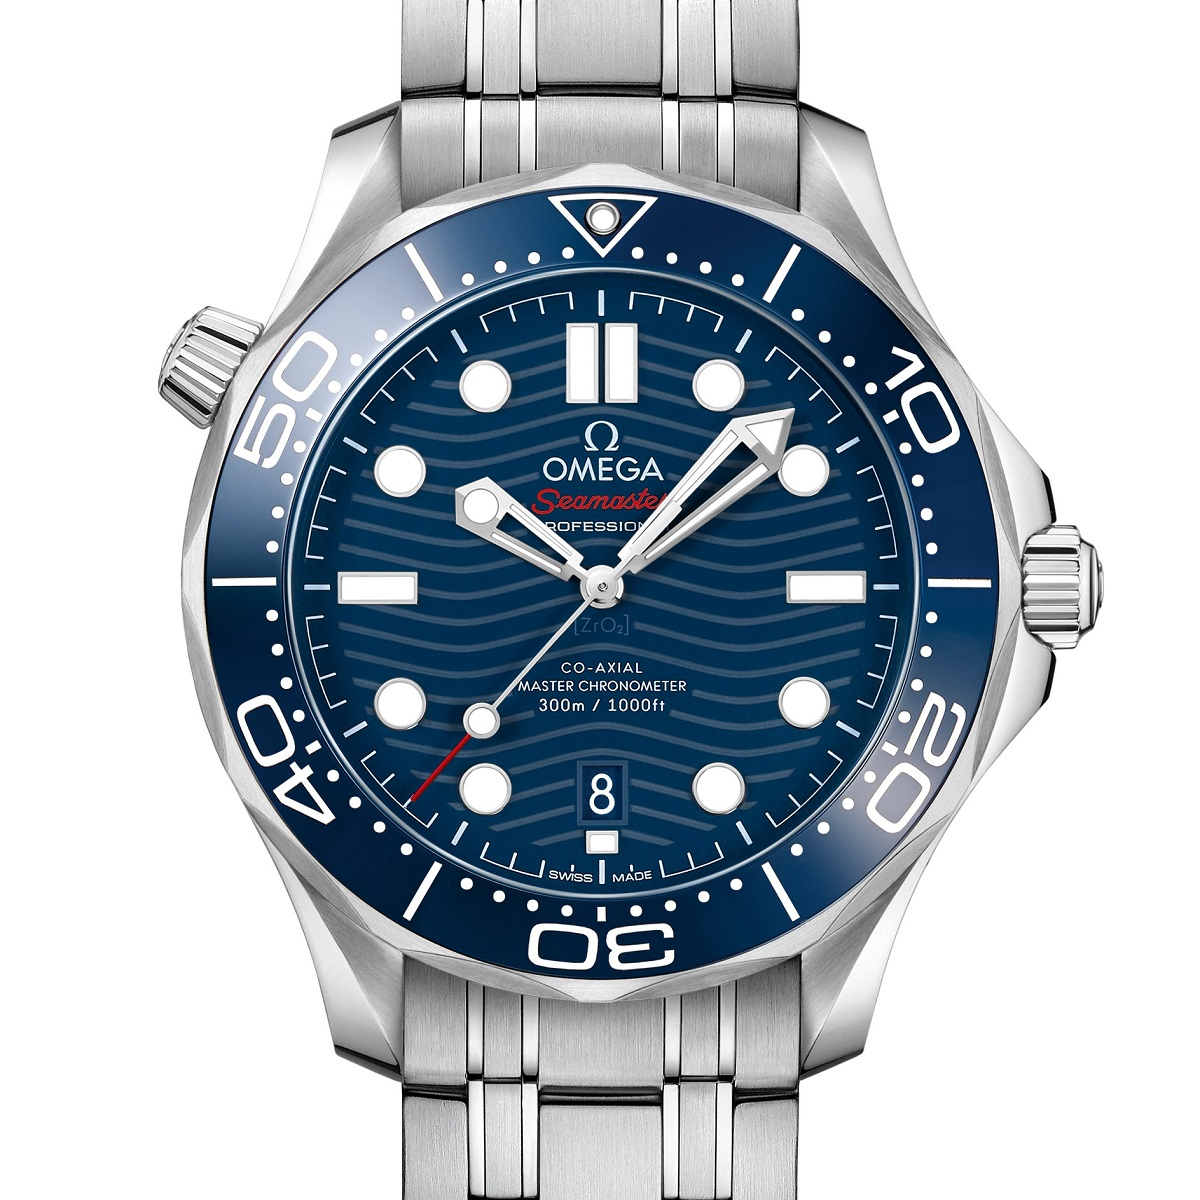 Naziv: Omega-Seamaster-Professional-Diver-300M-42mm-Watch-08.jpg, pregleda: 223, veličina: 375,0 KB